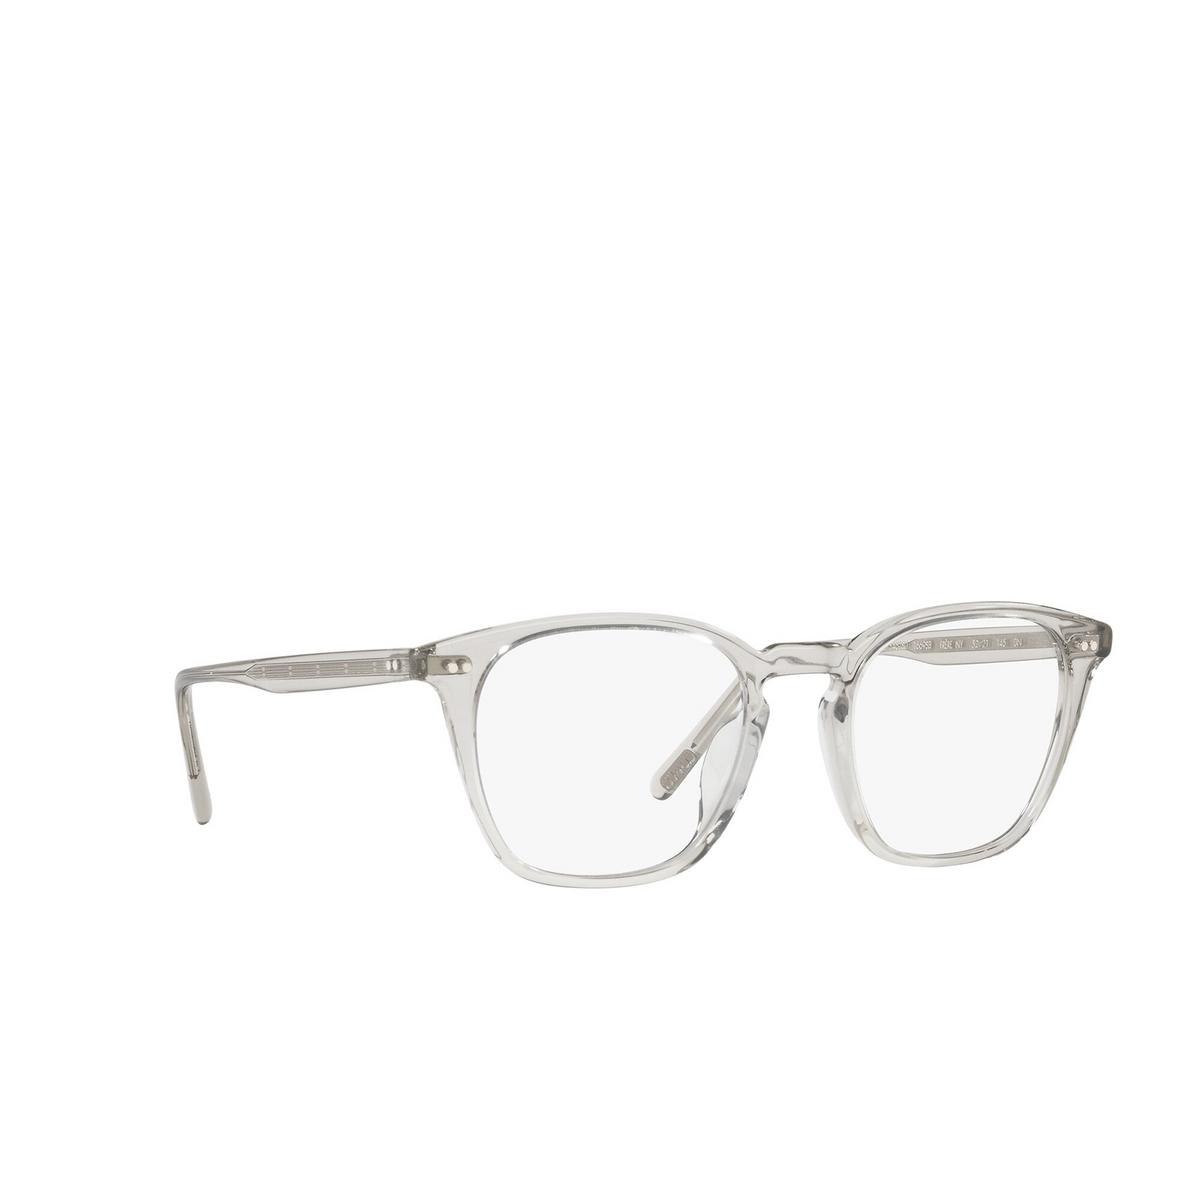 Oliver Peoples® Square Sunglasses: Frère Ny OV5462SU color Black Diamond 1669SB - three-quarters view.